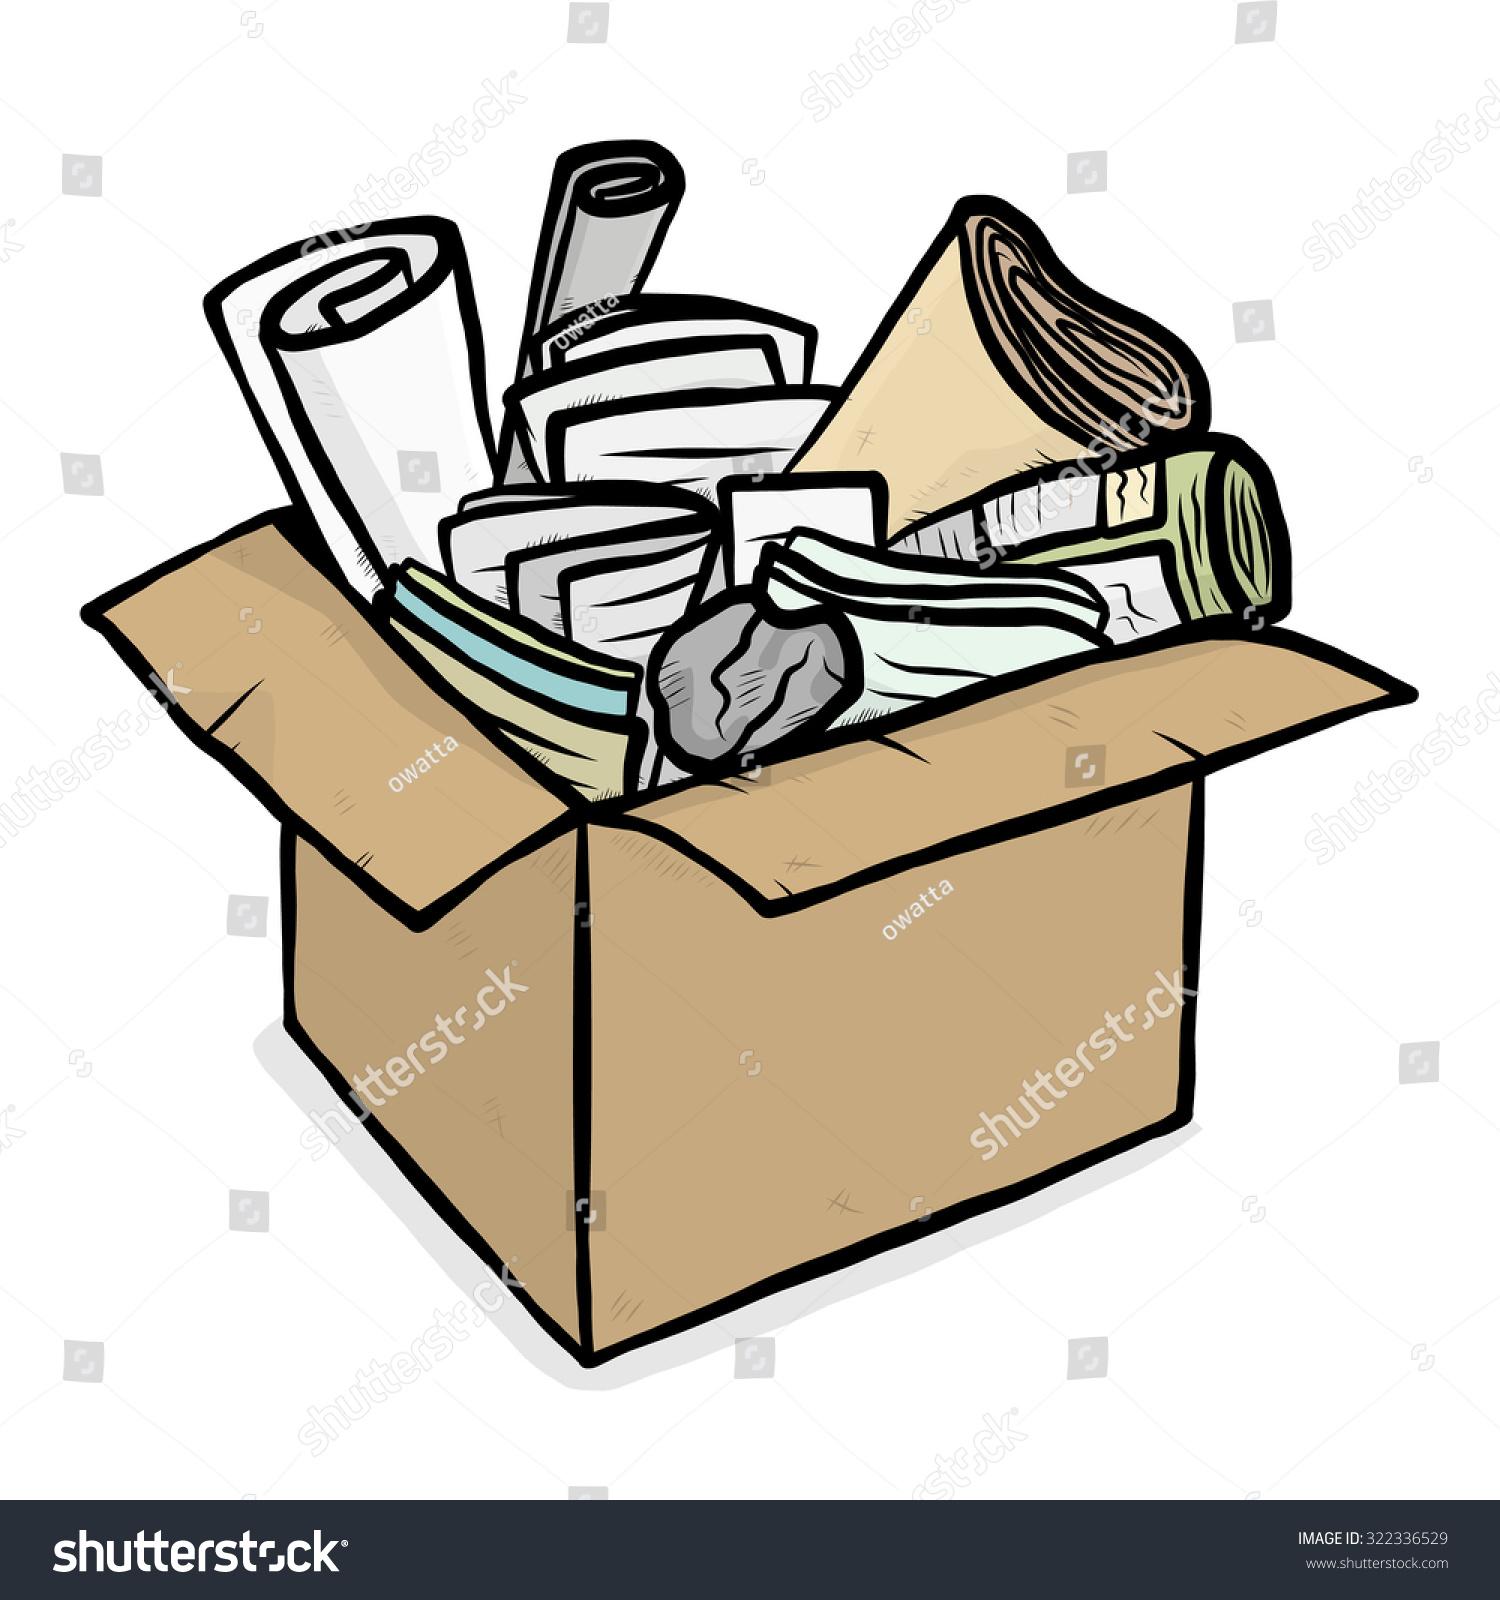 Paper Trash In Cardboard Box    Cartoon Vector And